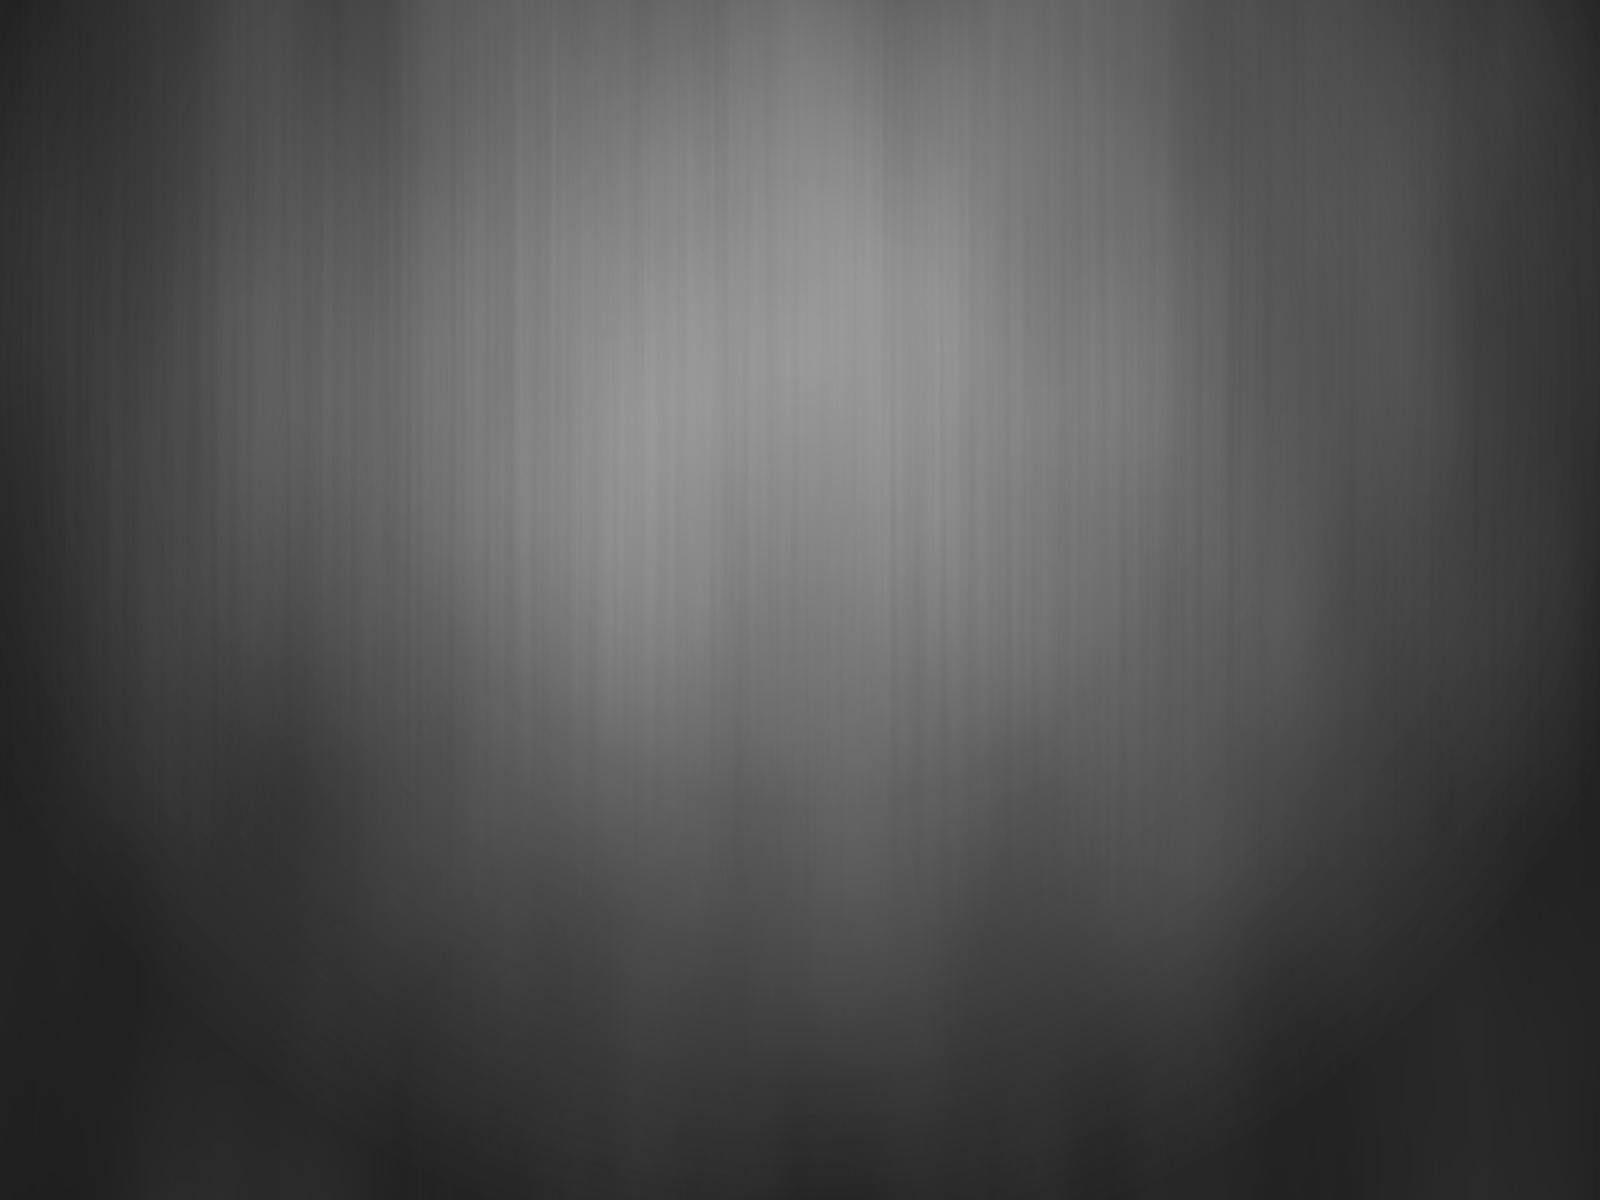 Light Black Color Background 1600x1200 Wallpaper Teahub Io